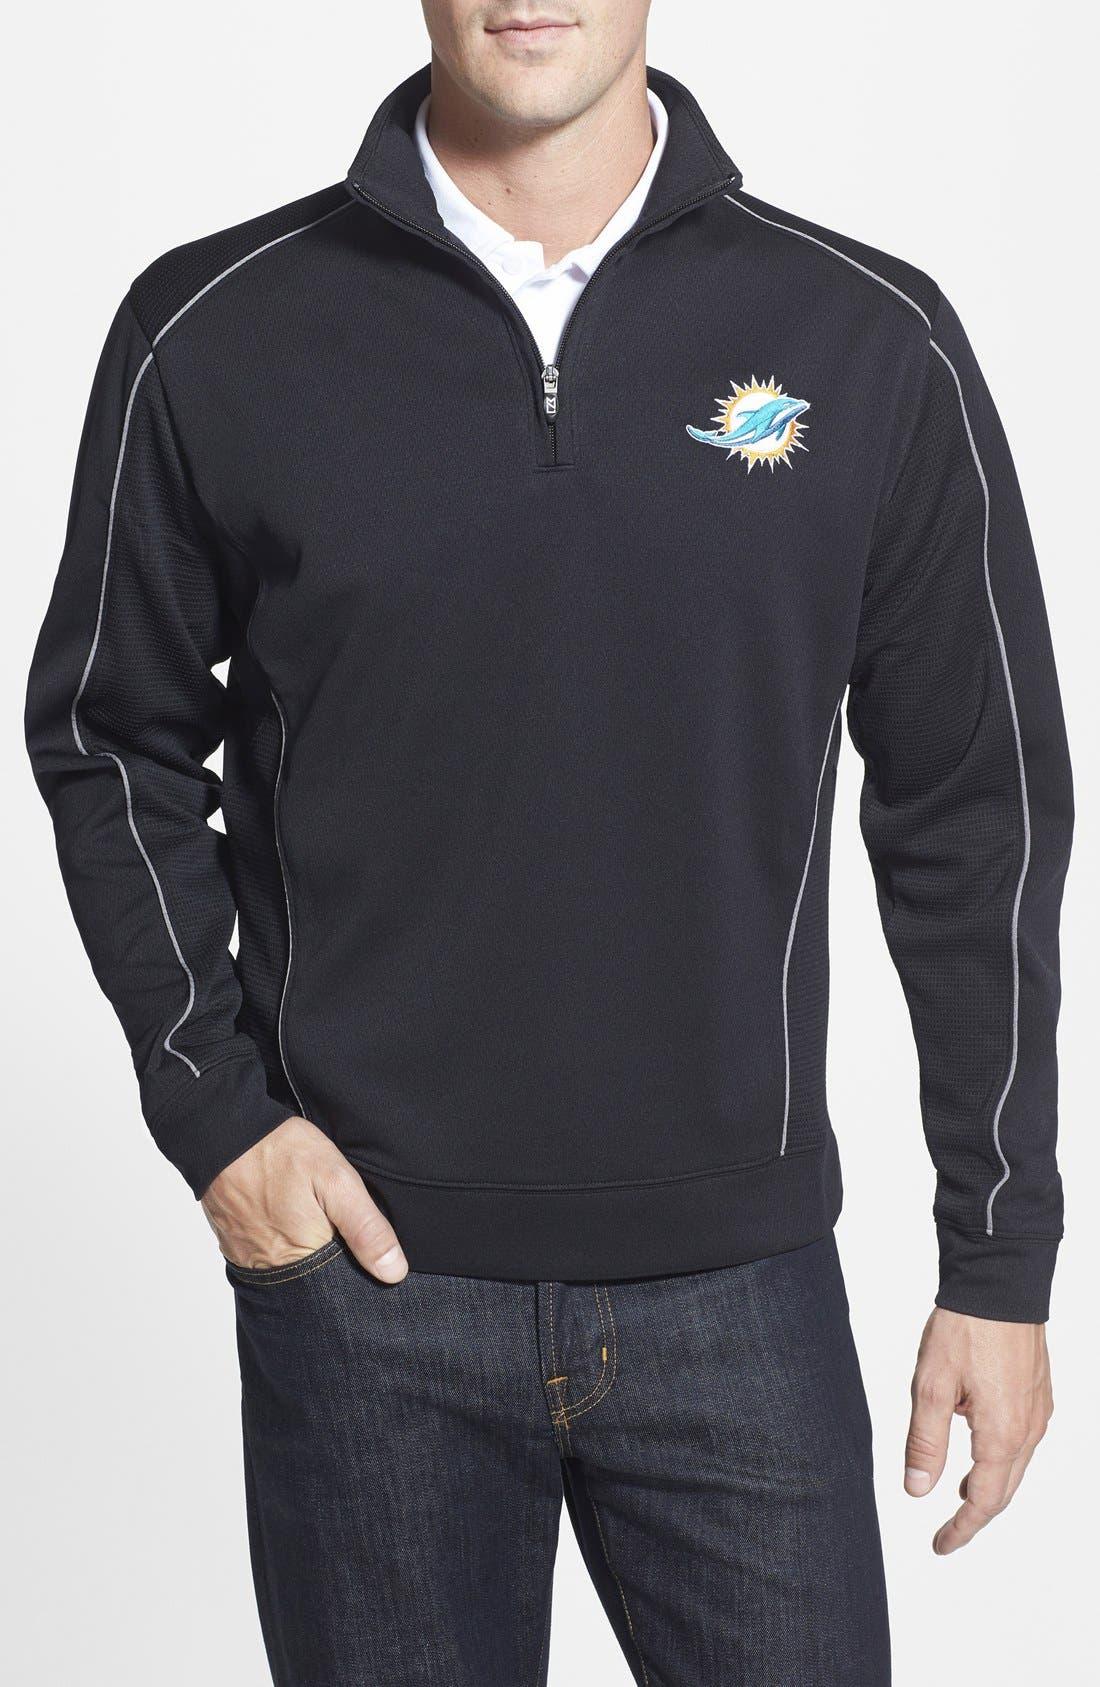 Main Image - Cutter & Buck Miami Dolphins - Edge DryTec Moisture Wicking Half Zip Pullover